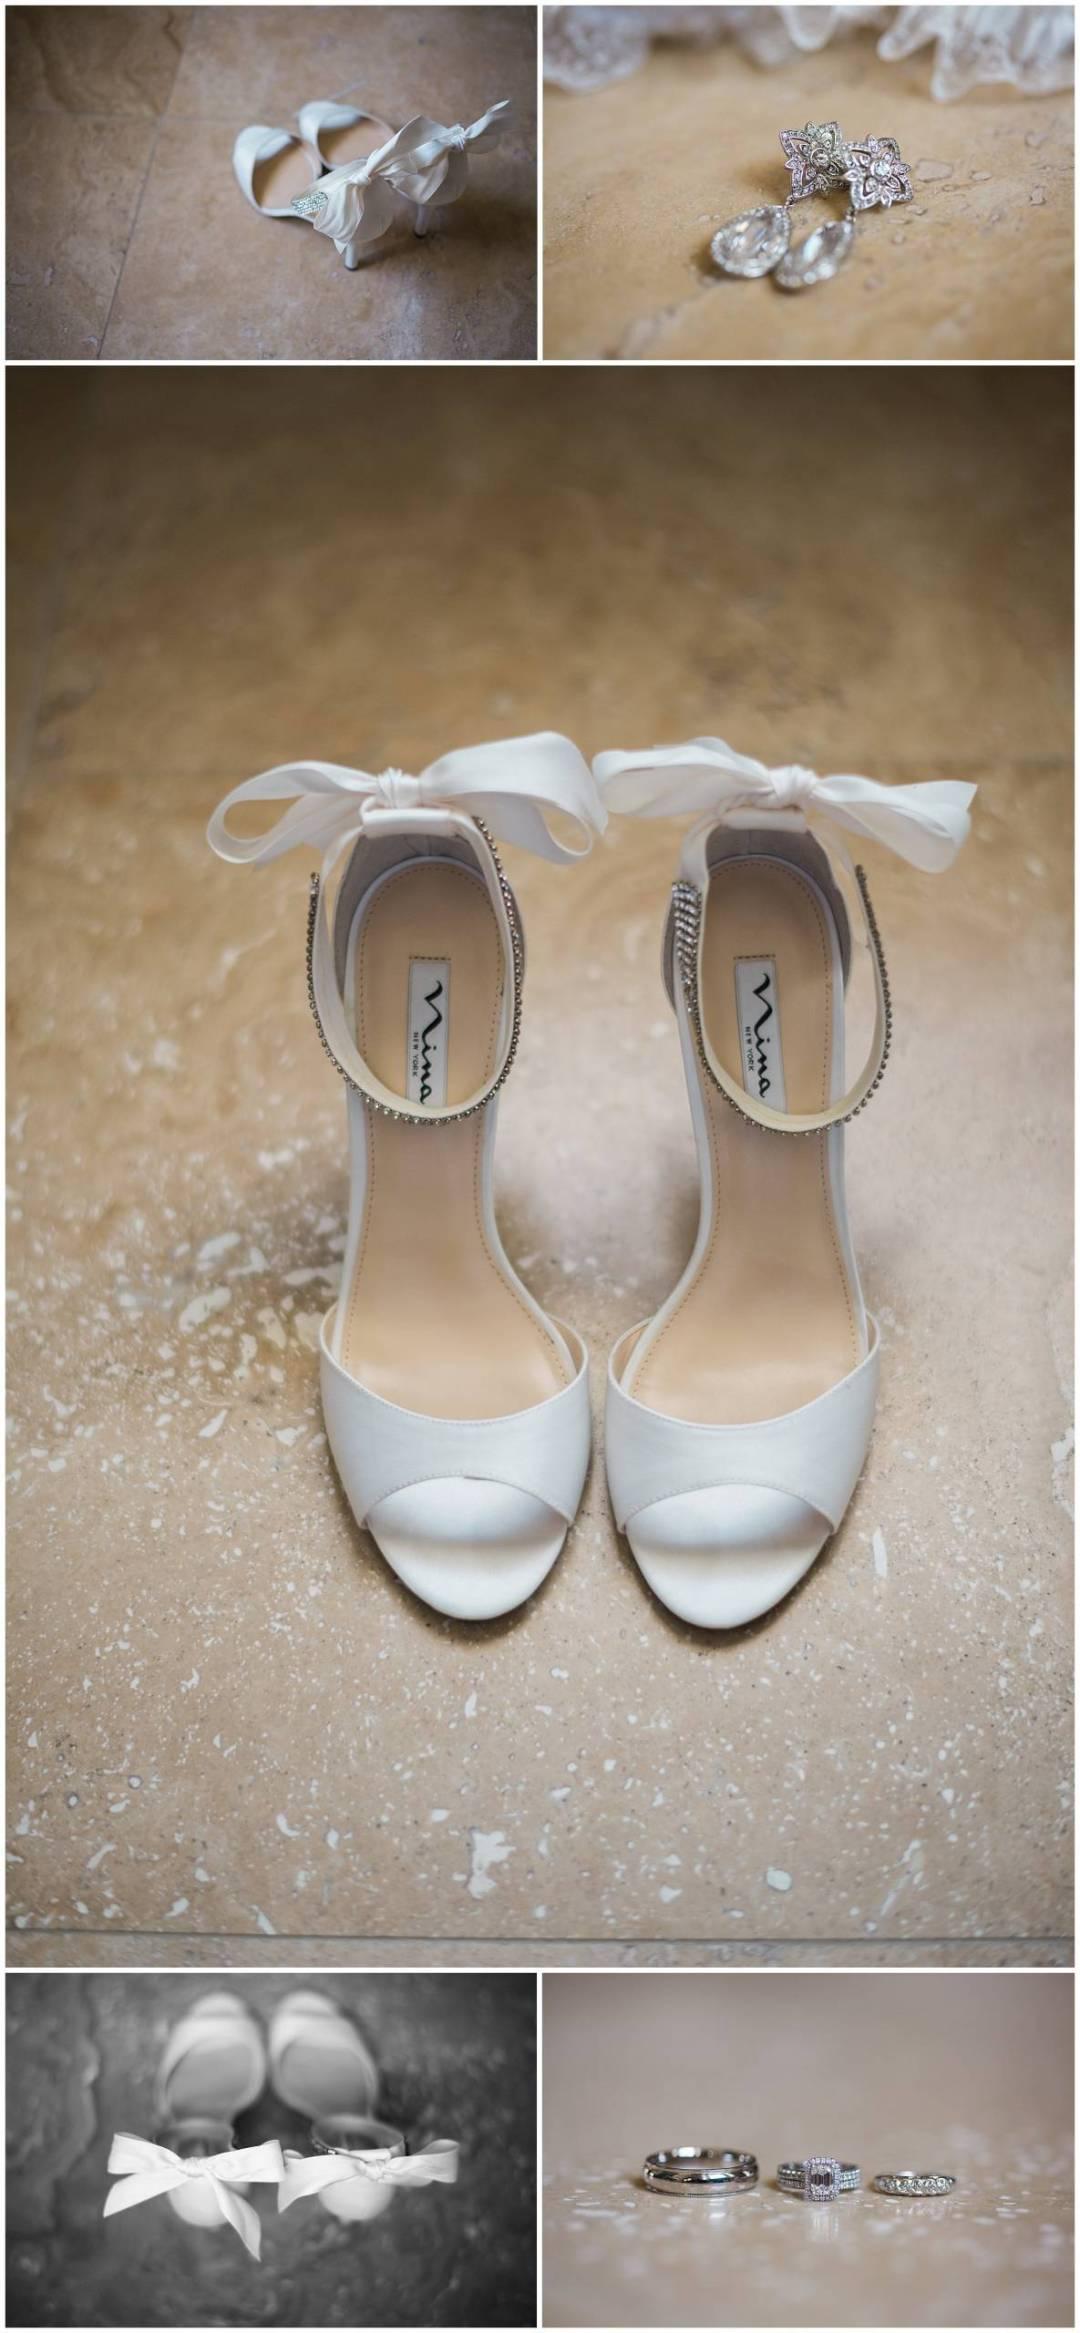 Kelcie & Devin Wedding Third Element Photography & Cinema Koetsier Ranch Visalia Tulare Fresno Hybrid Film Wedding Photographer_0001